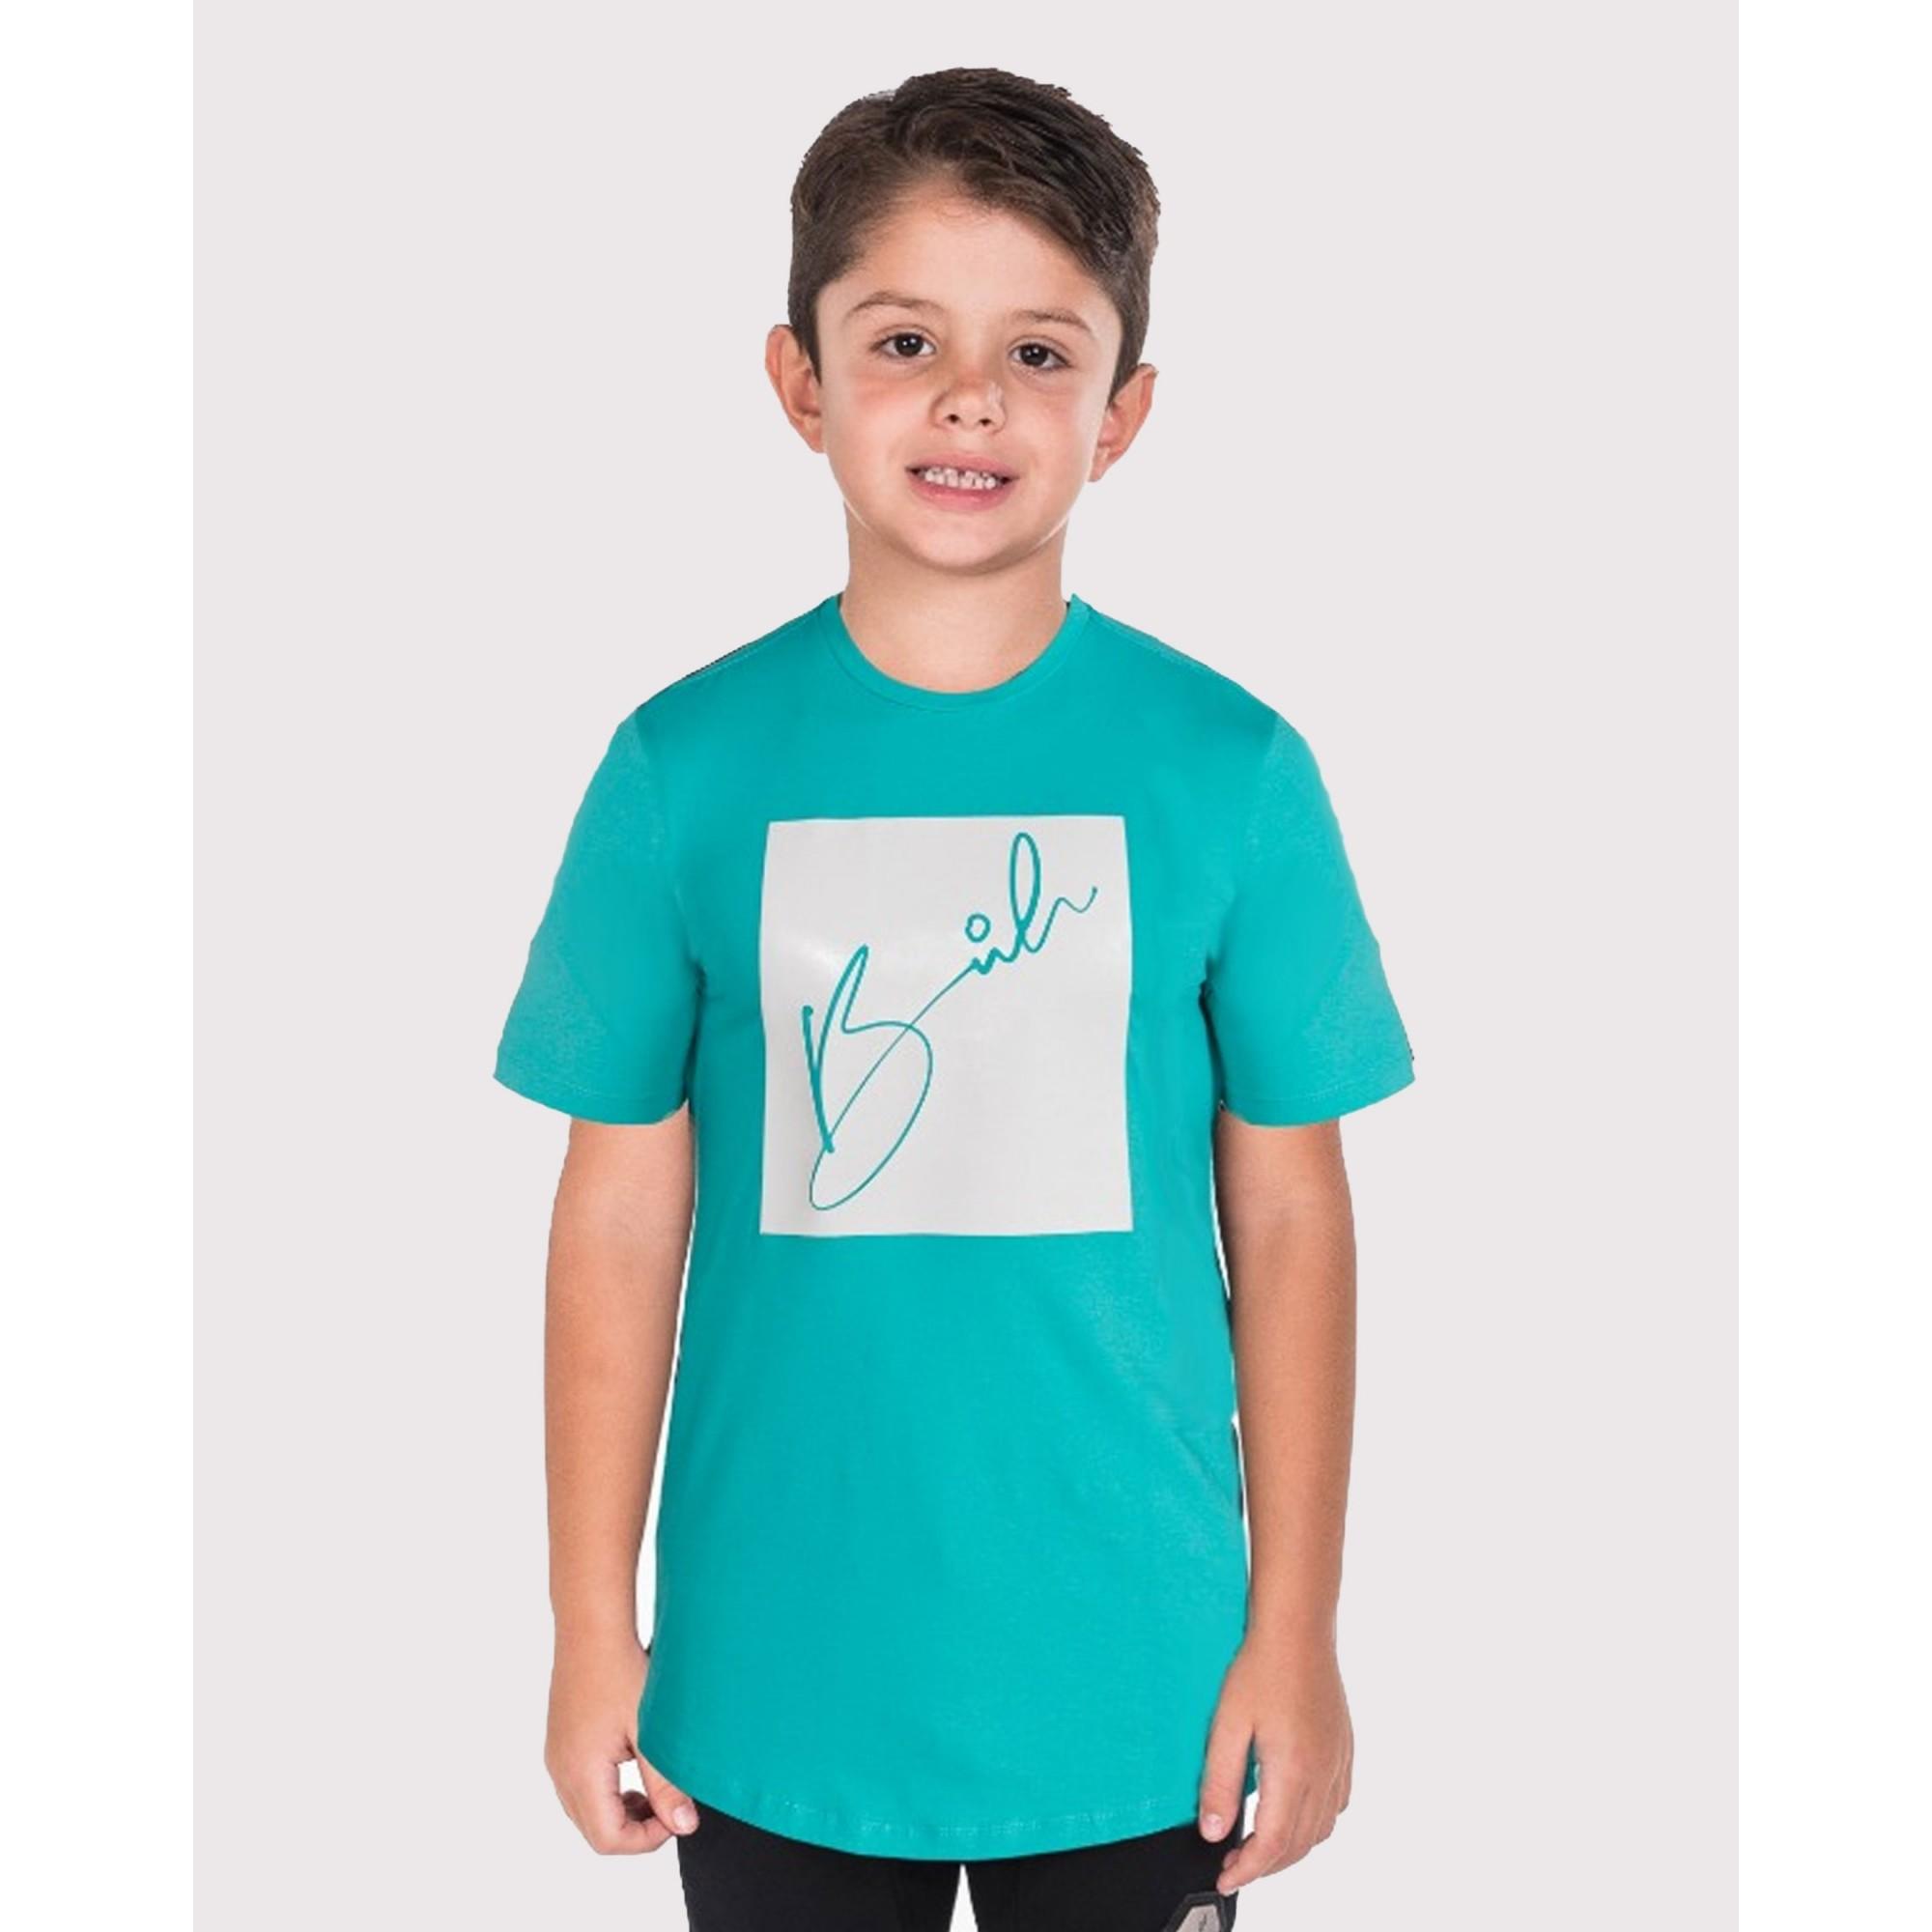 Camiseta Buh Kids Candy Square Blue & White